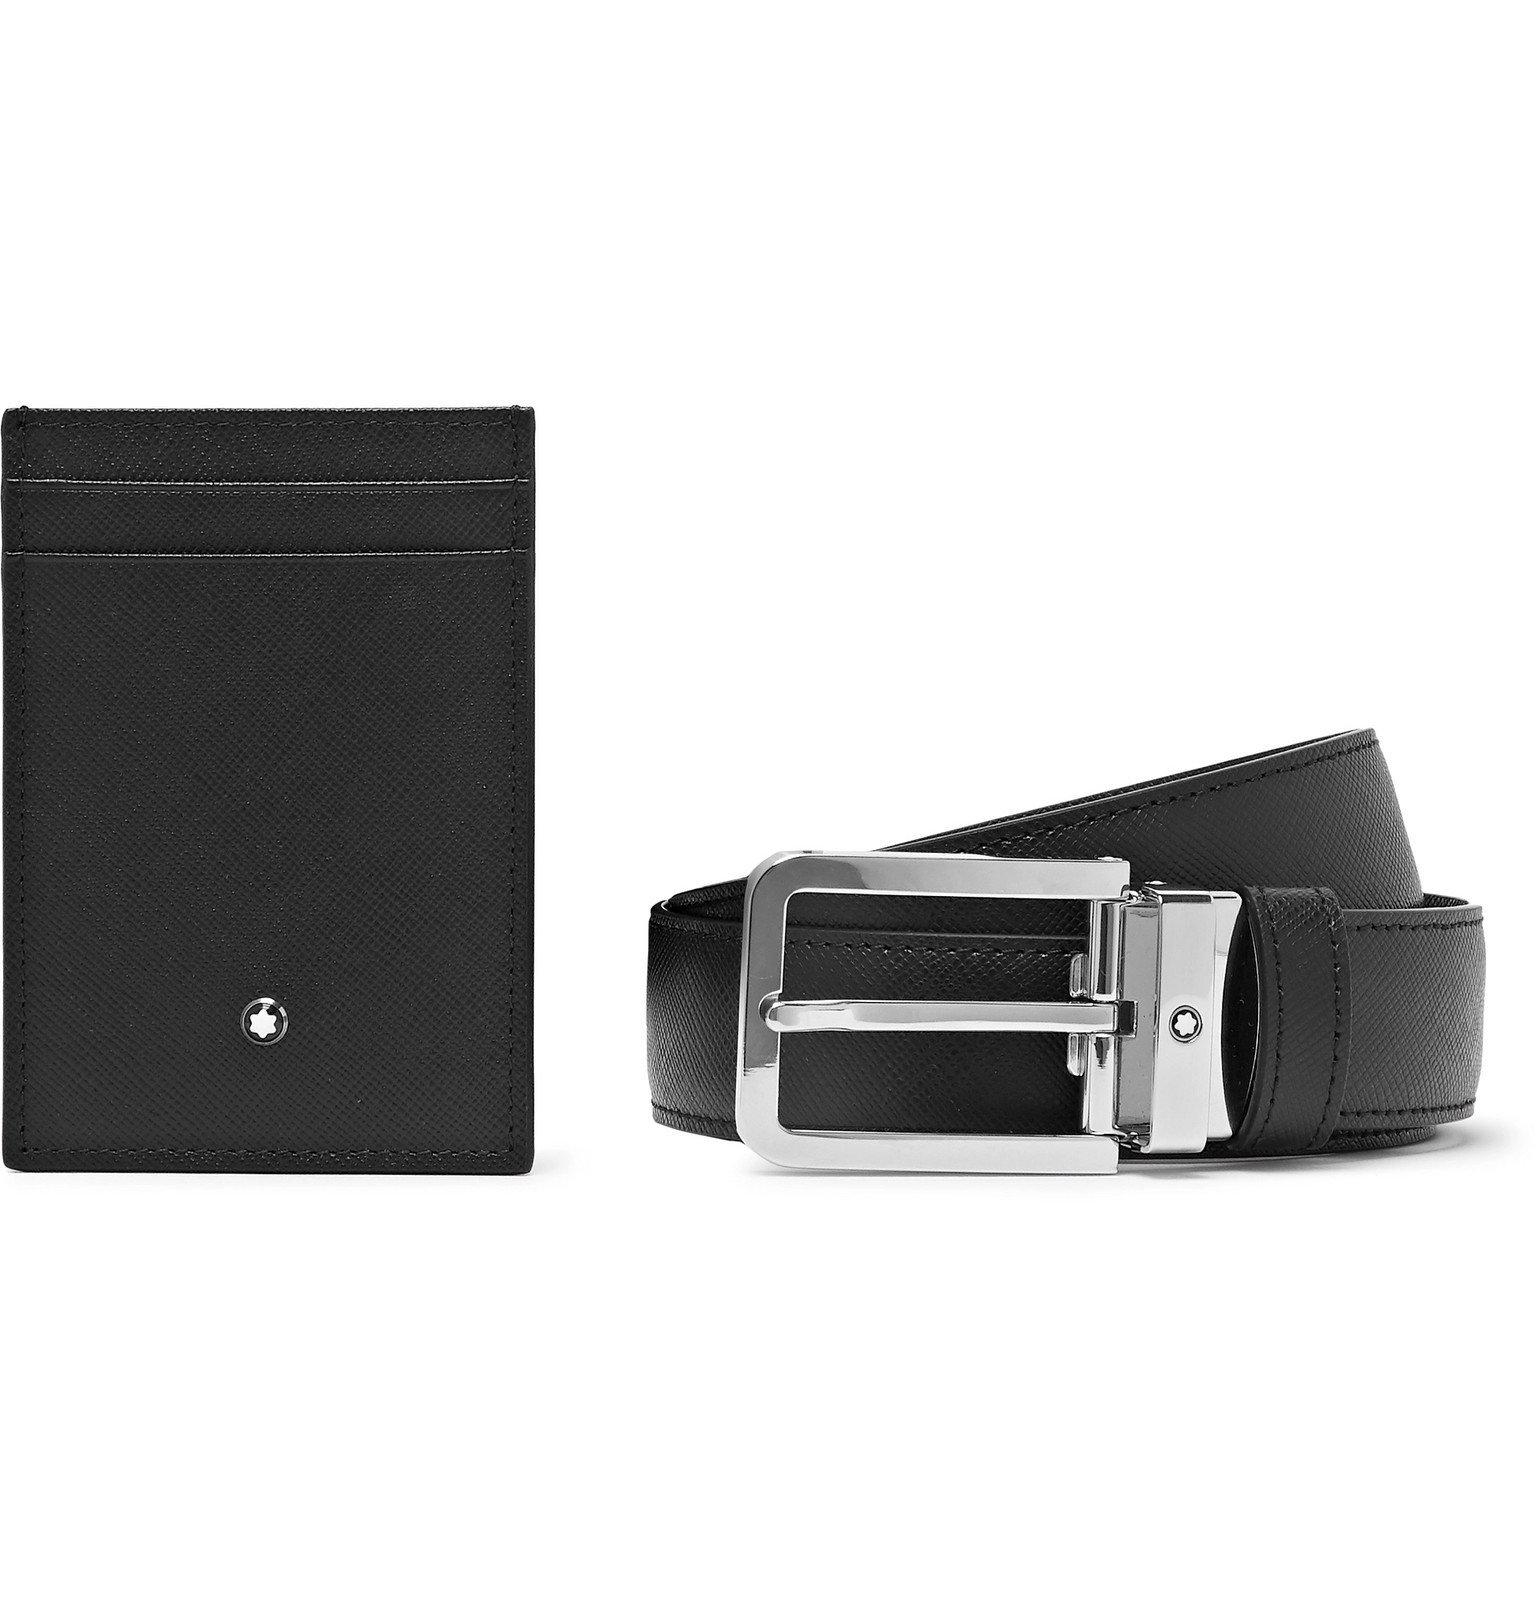 Photo: Montblanc - Cross-Grain Leather Belt and Cardholder Set - Black